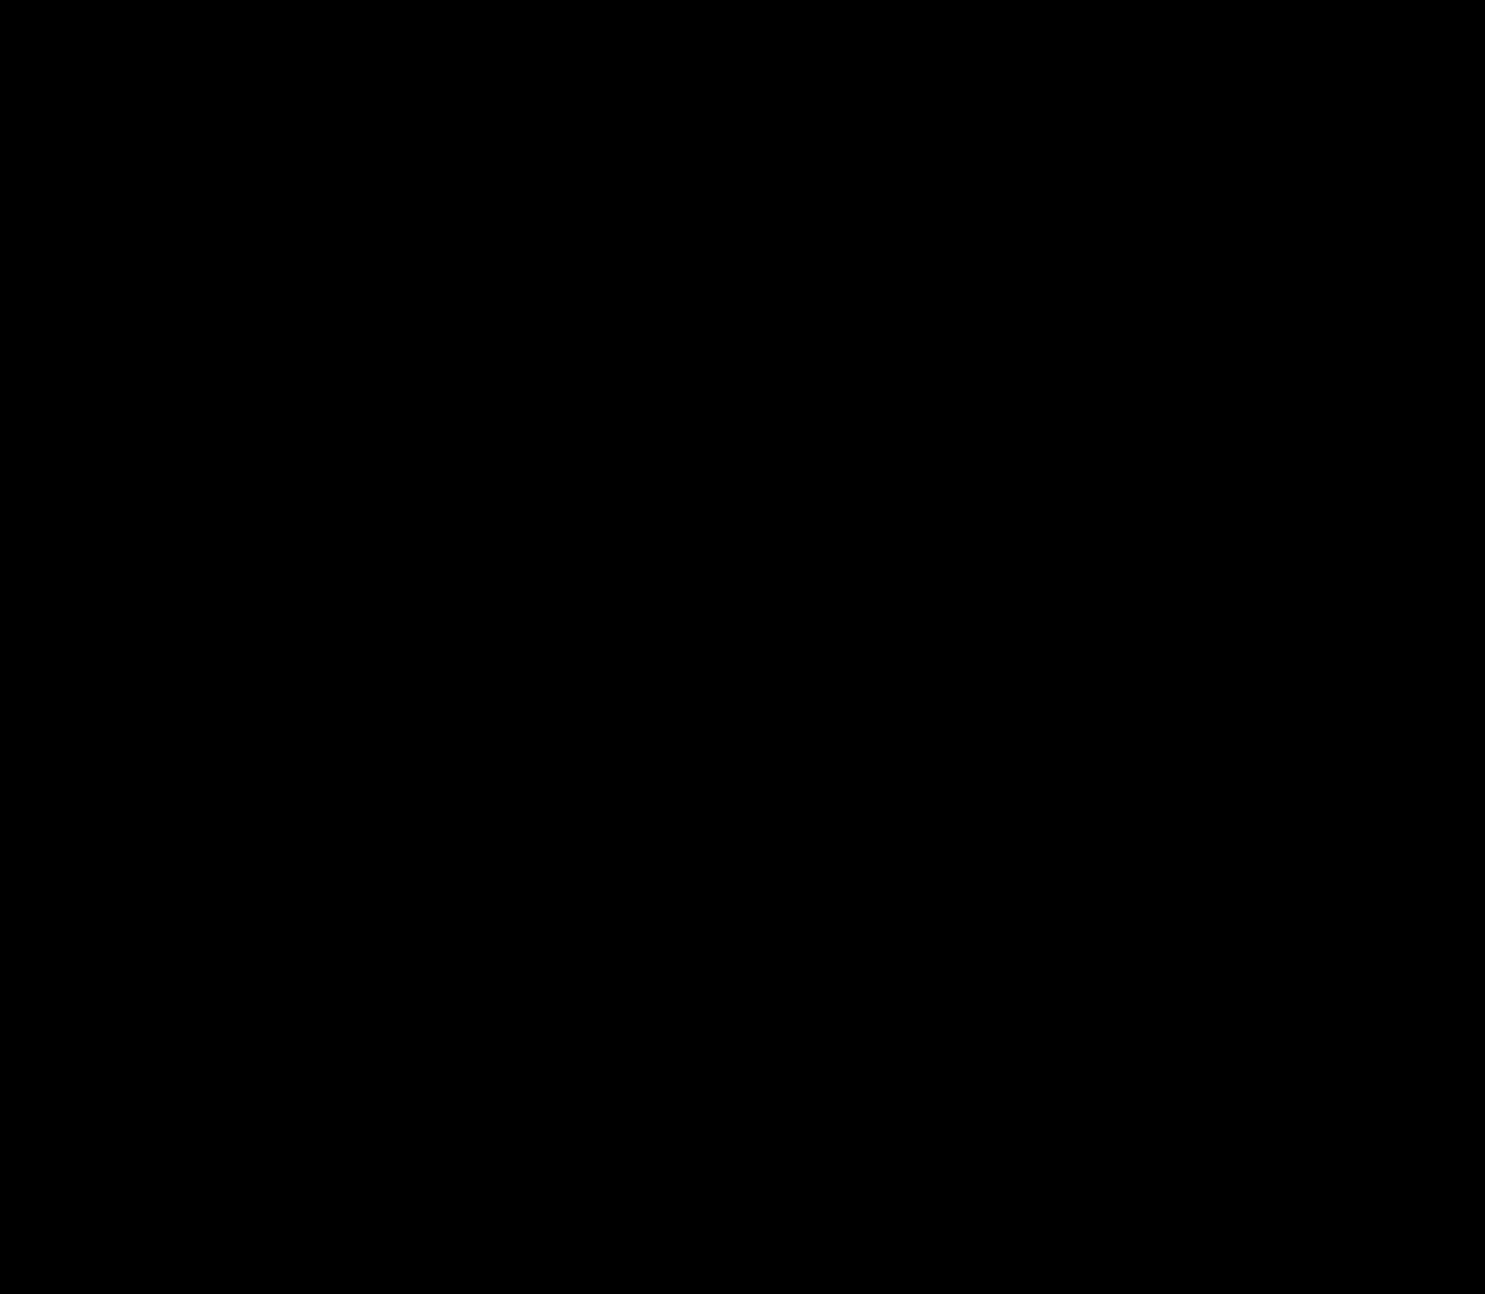 Double Angle Identities 2 theta